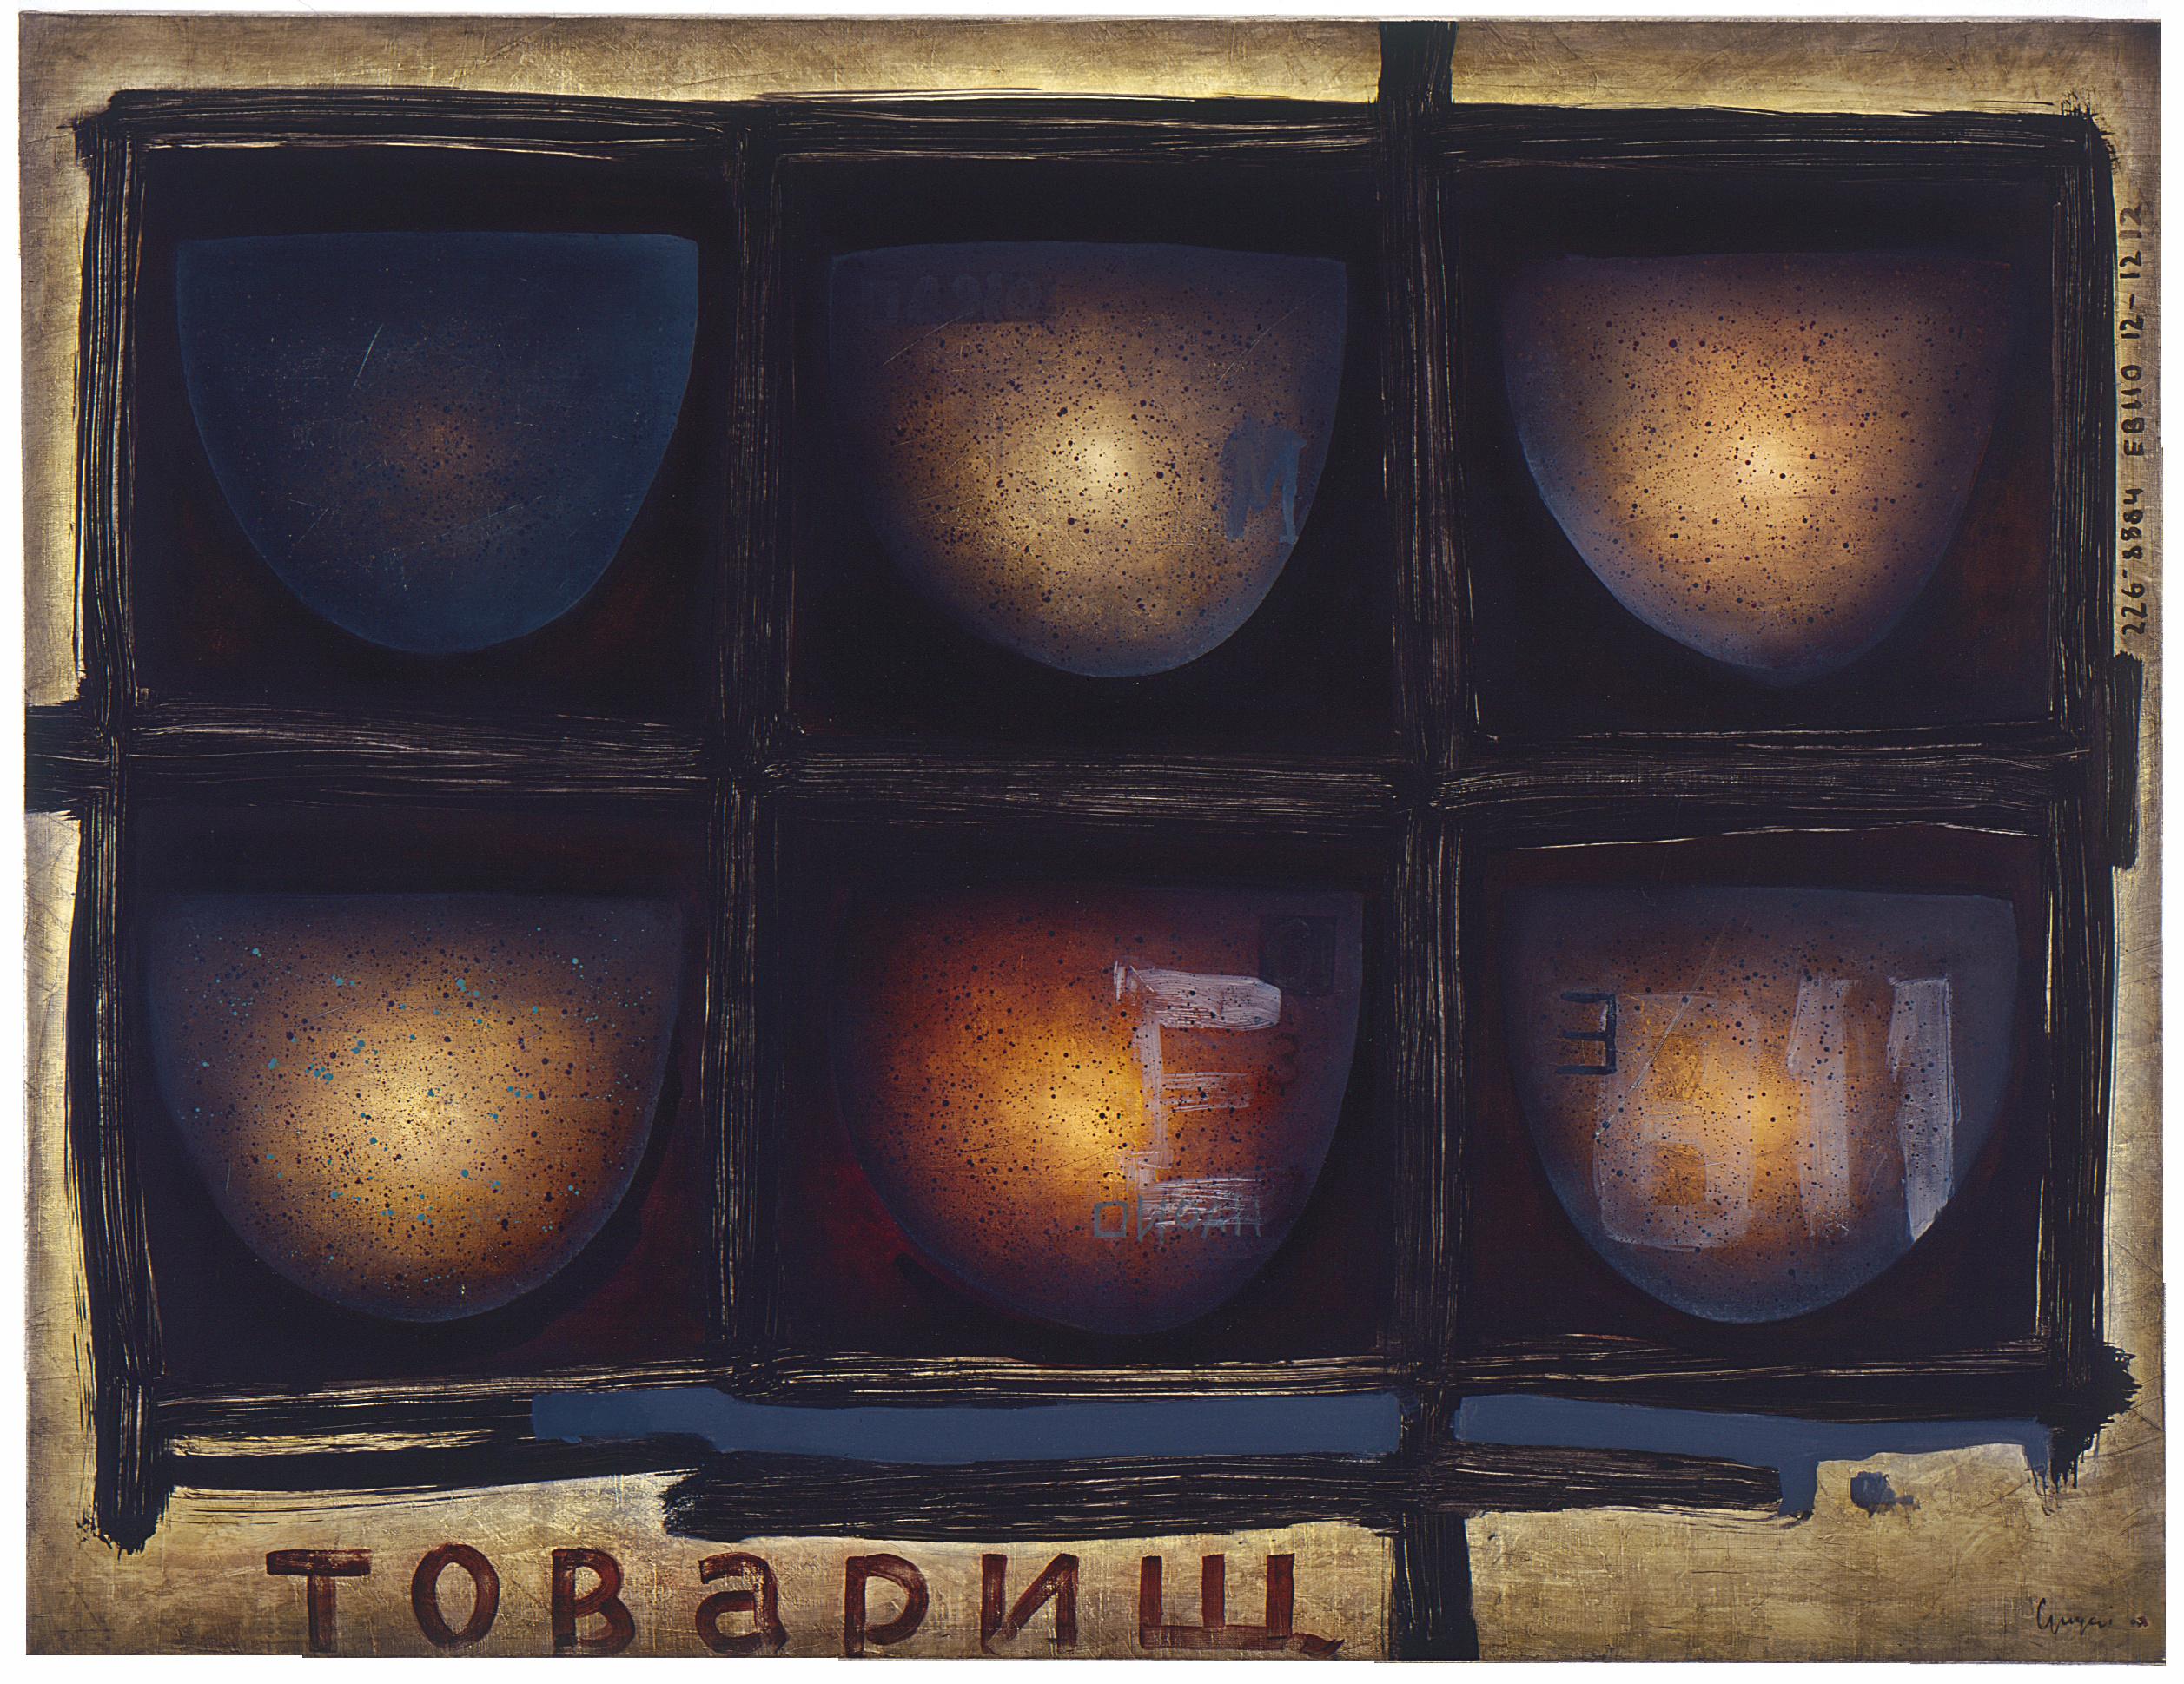 Speckled Bowls (2003)